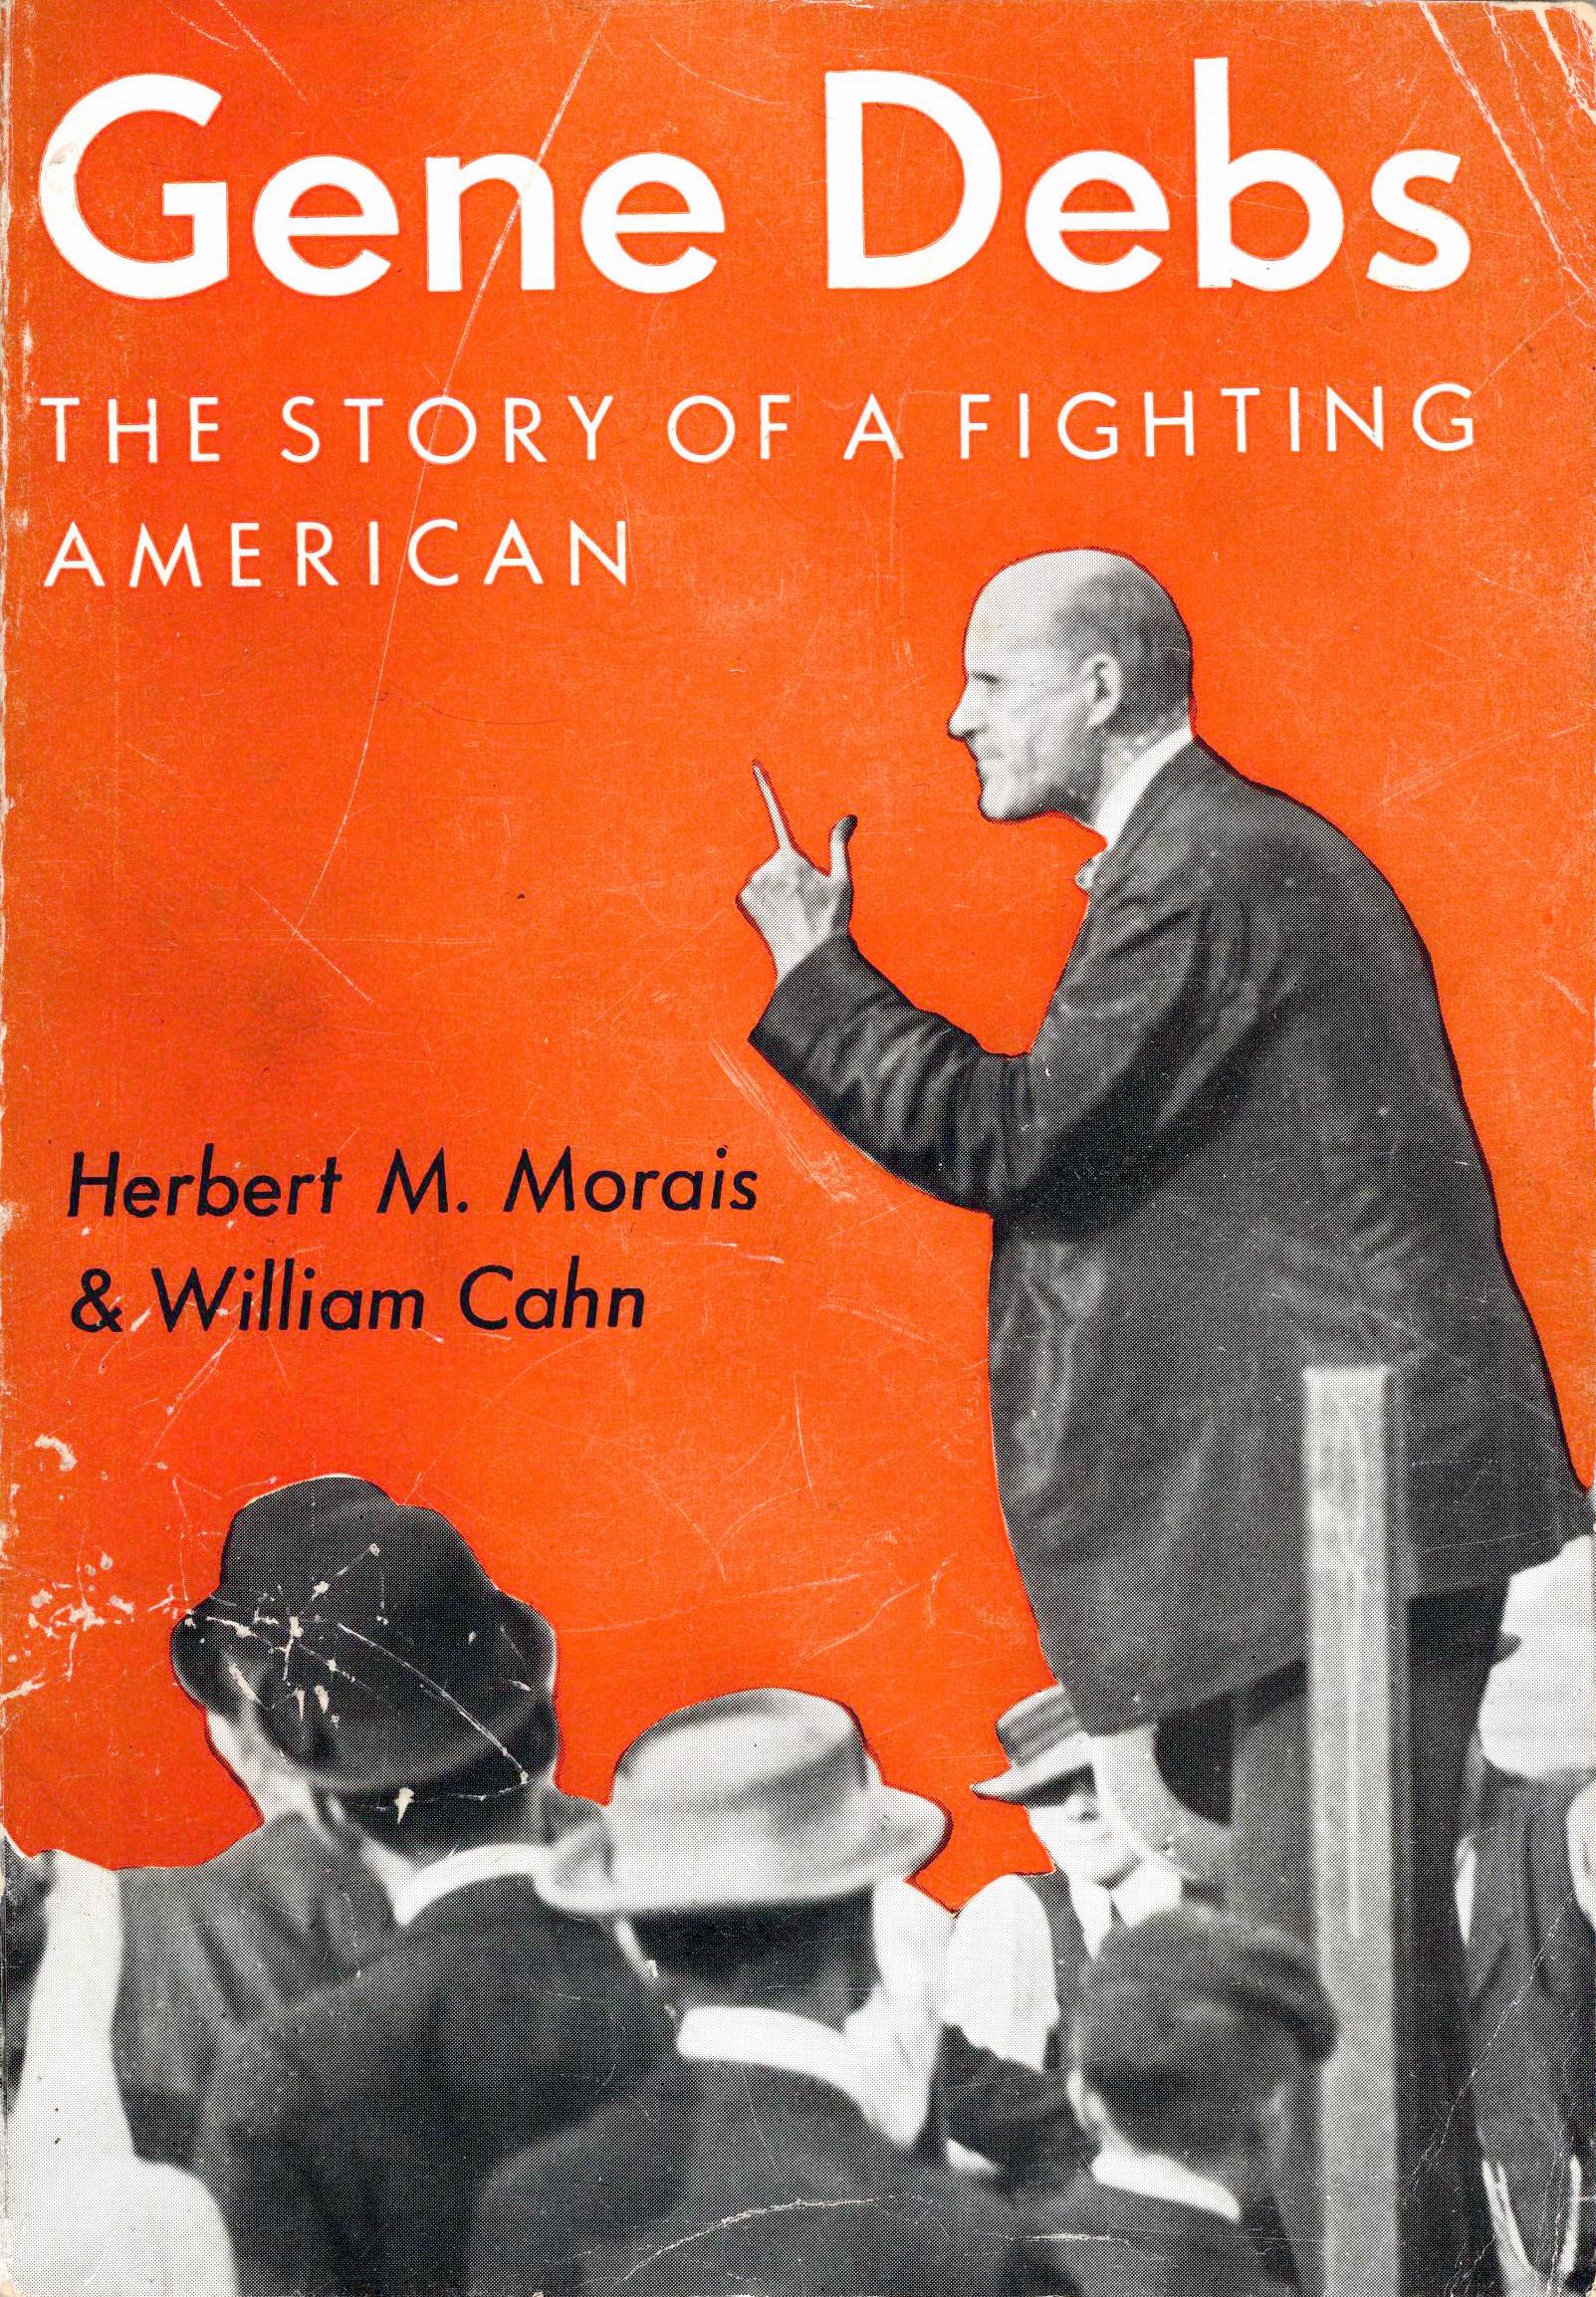 Herbert M. Morais, William Cahn: Gene Debs - The Story of a Fighting American